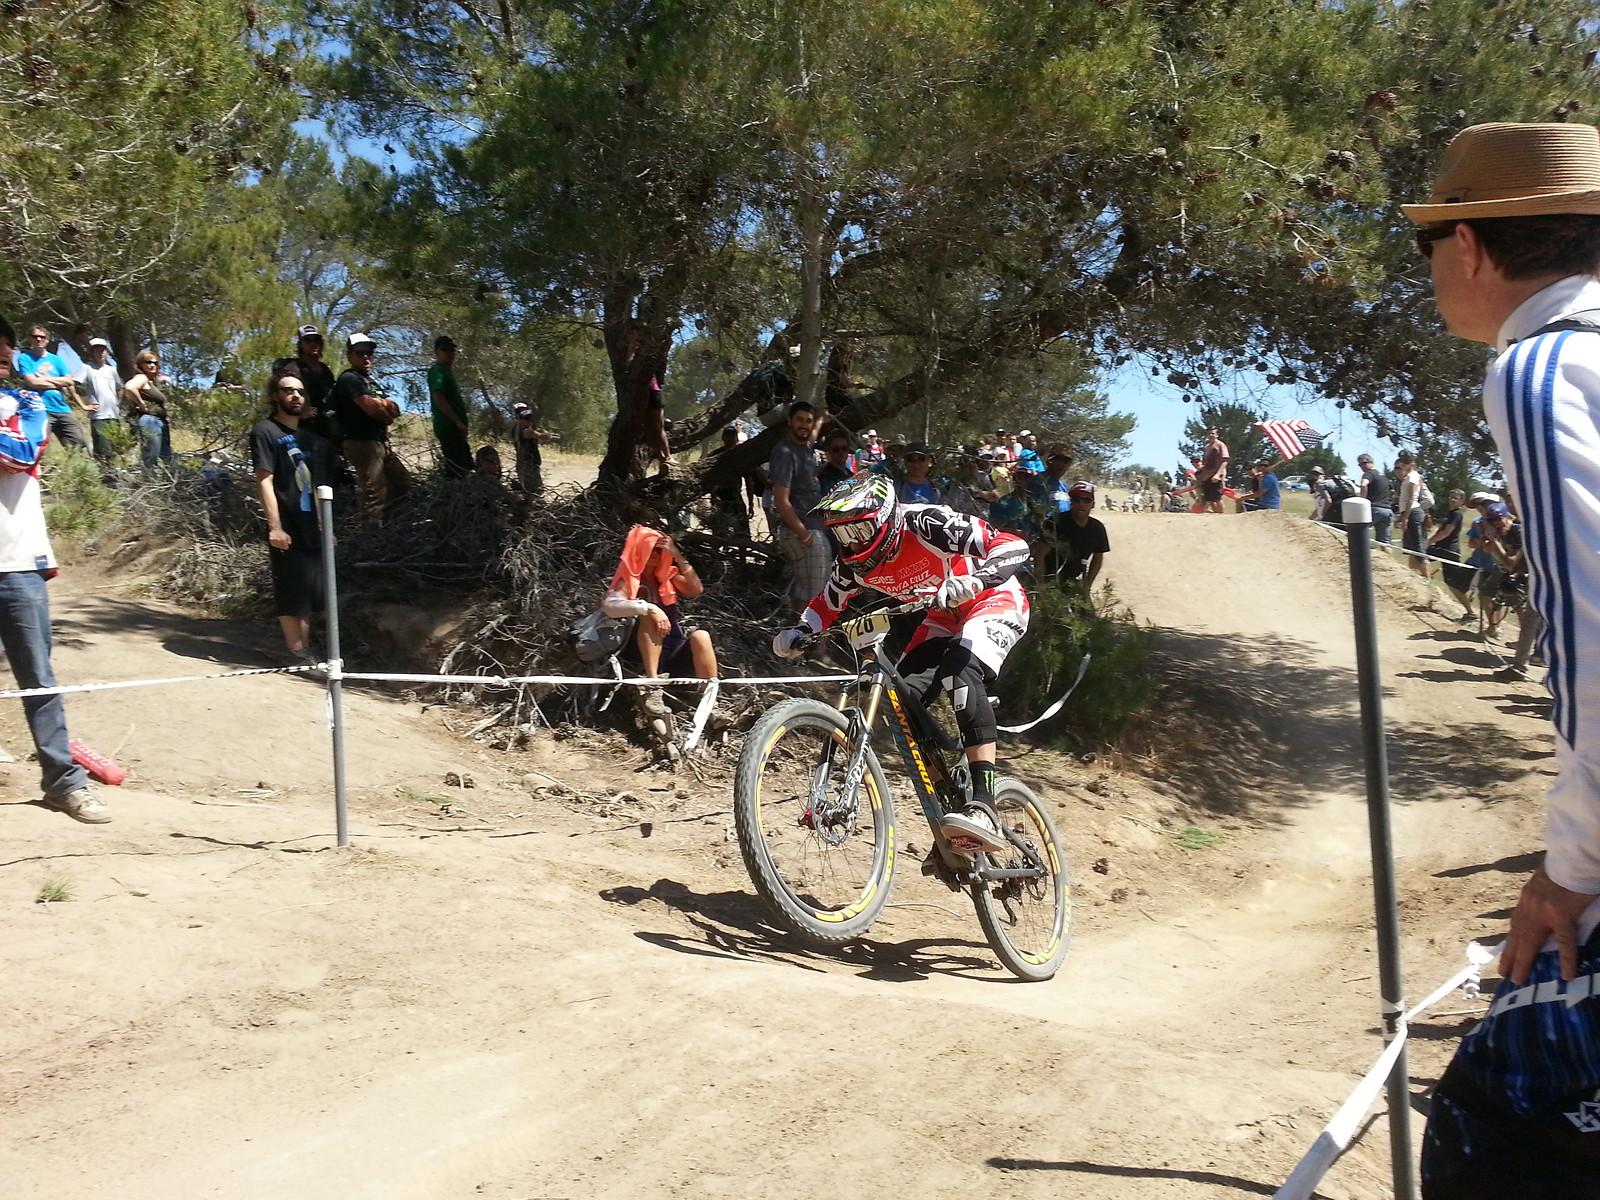 Peaty 2 - djames - Mountain Biking Pictures - Vital MTB